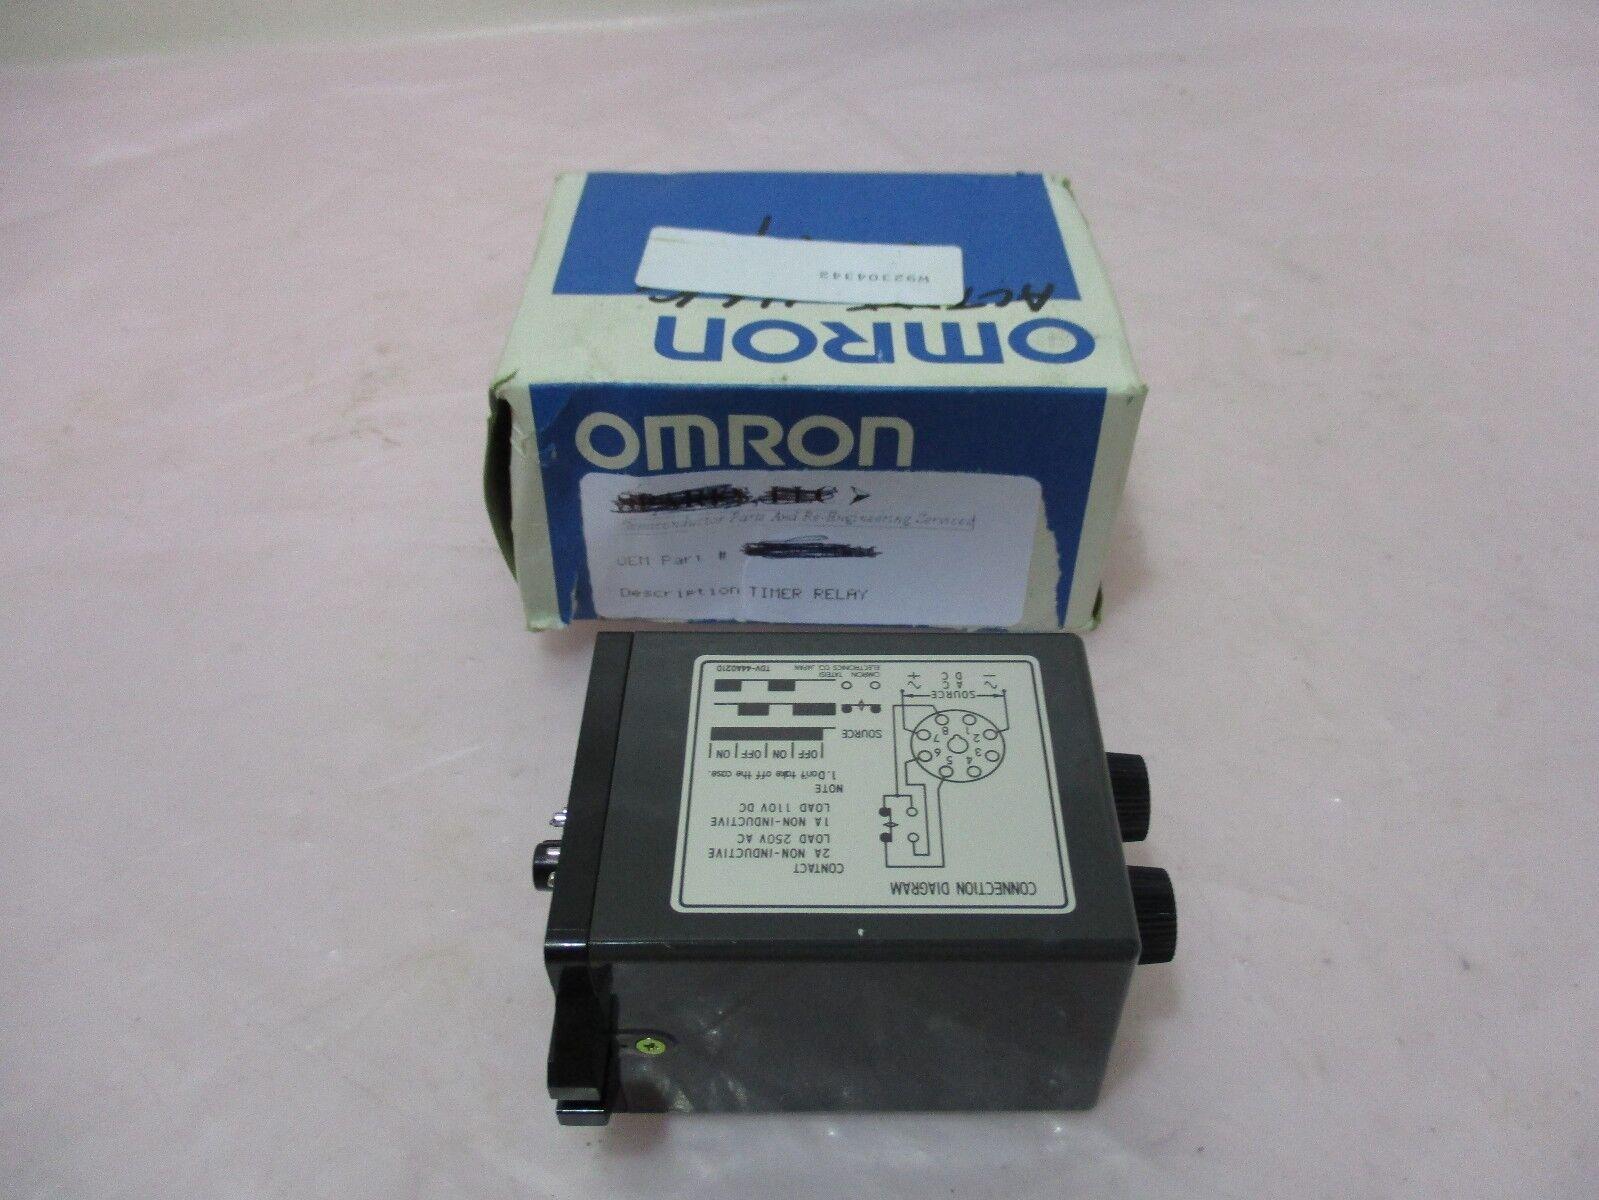 Omron TDV-1 Twin Timer, Relay, 24VDC, 50/60Hz, 420381